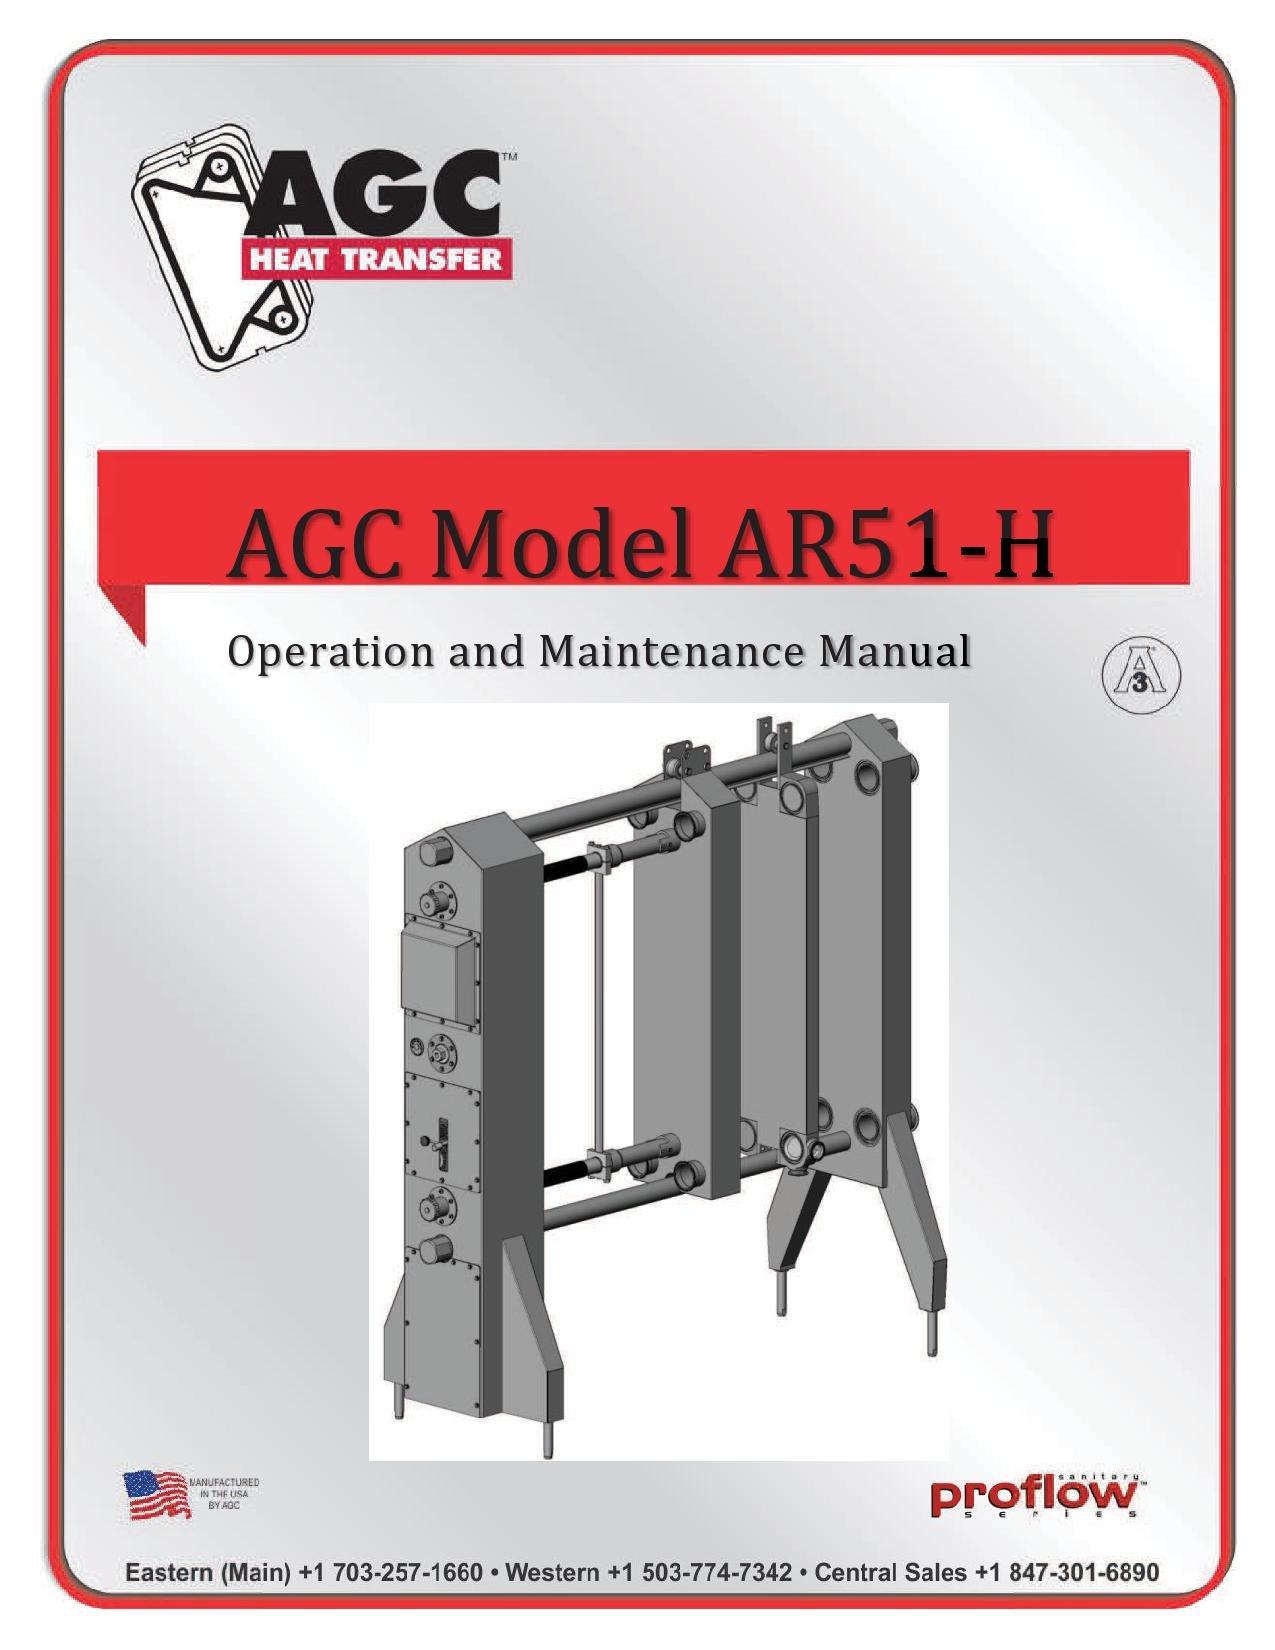 AR51-H OPERATION MANUAL